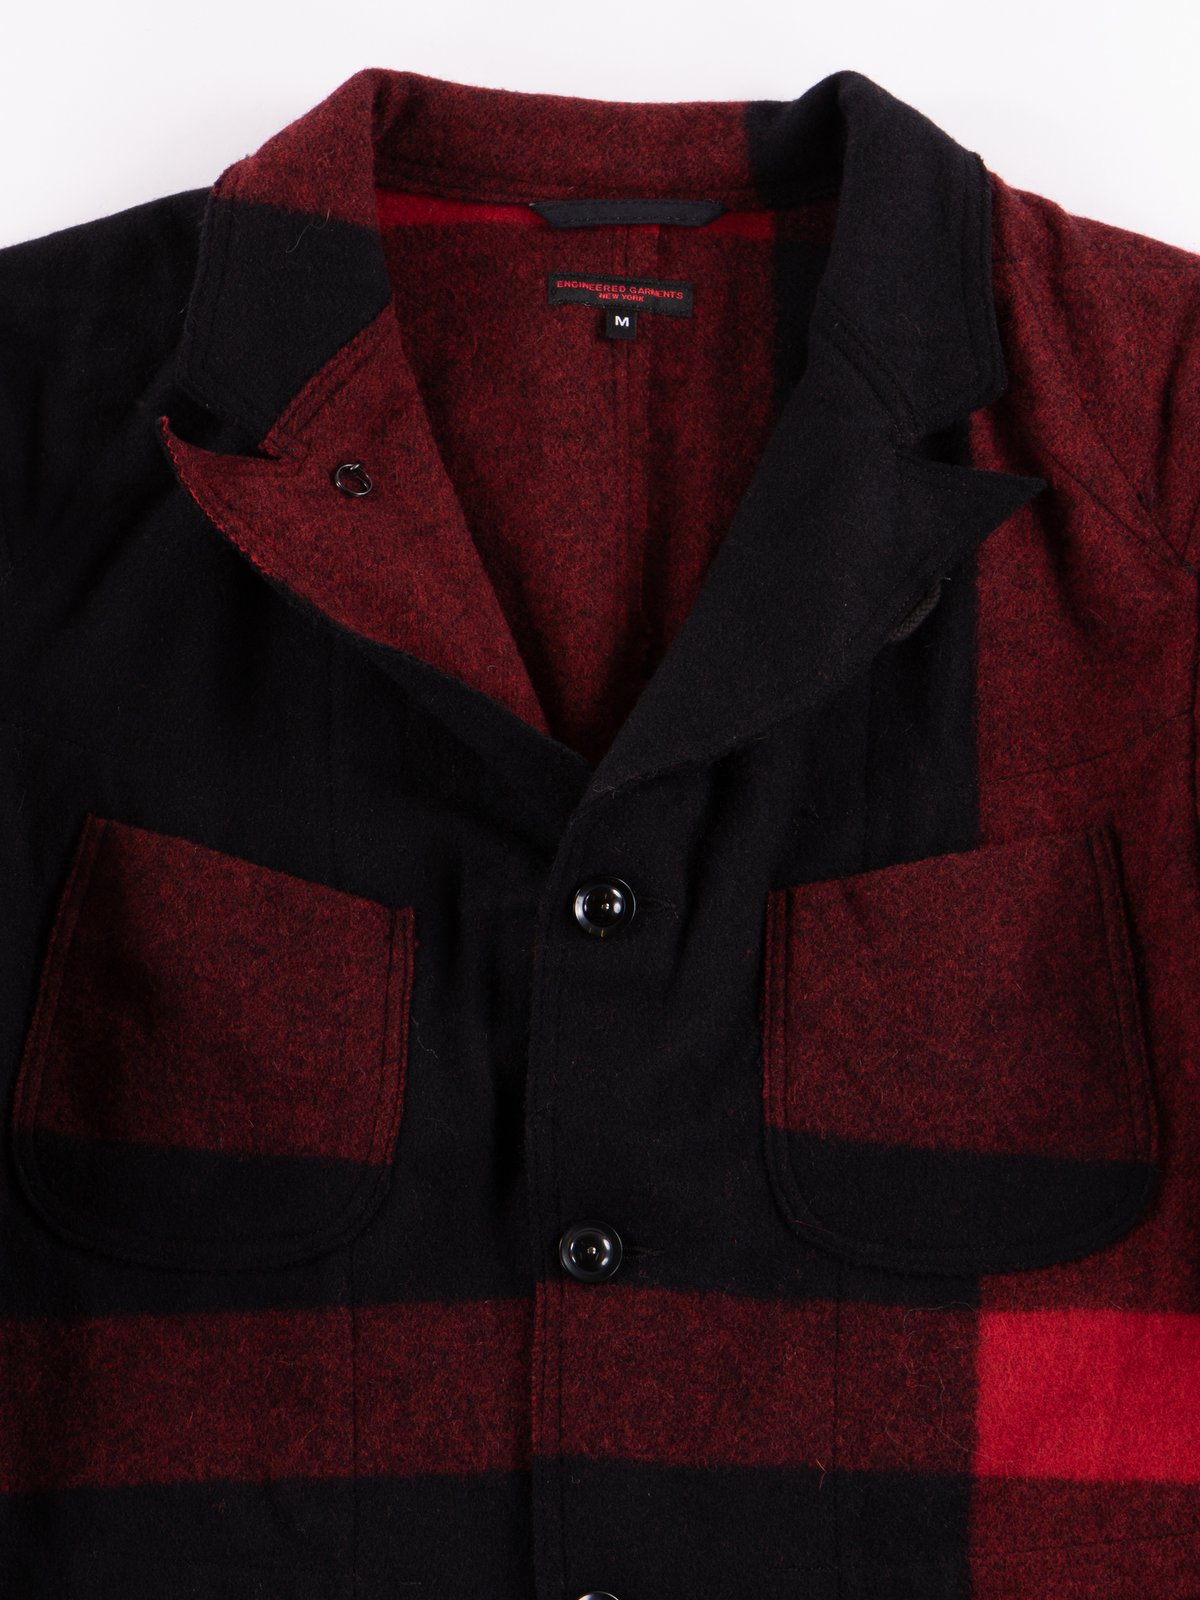 Black Big Plaid Wool Melton RE Bedford Jacket - Image 3